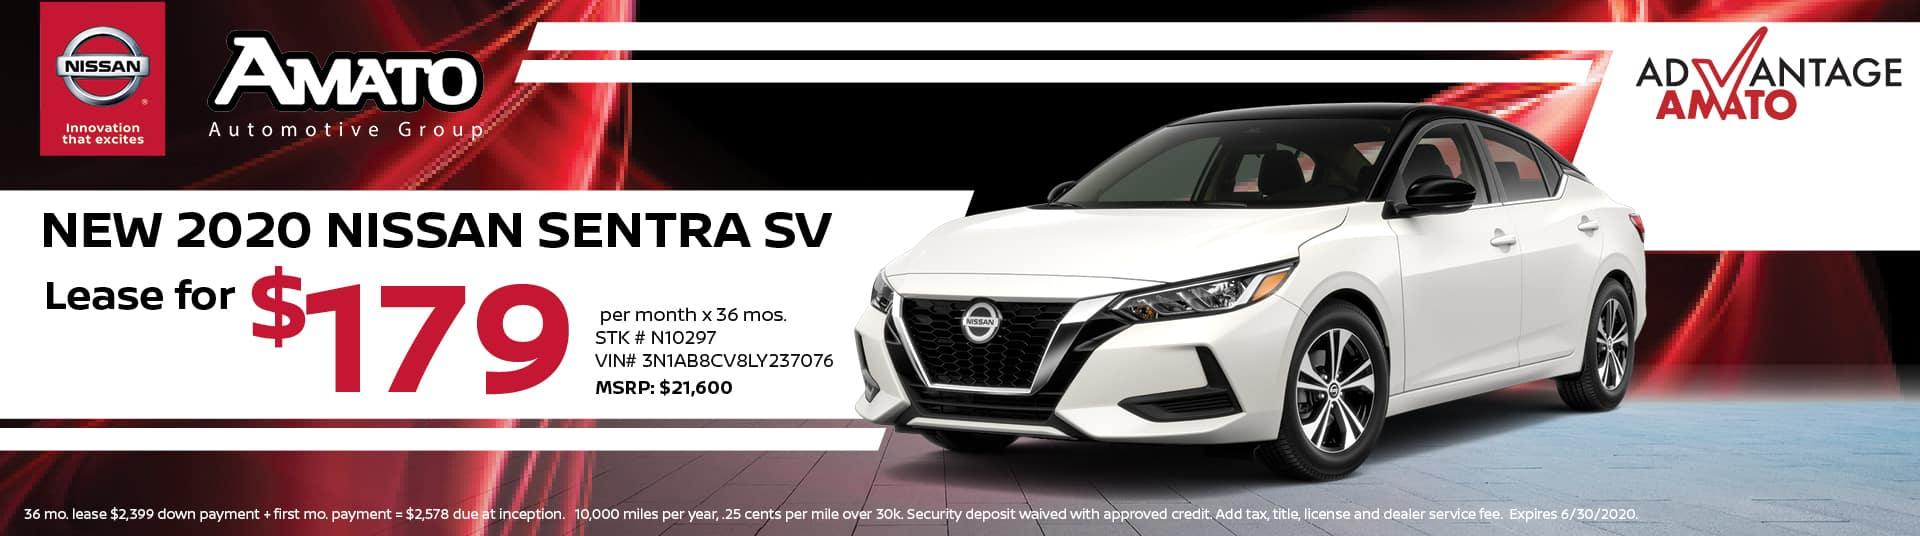 2020 Nissan Sentra Lease Deal